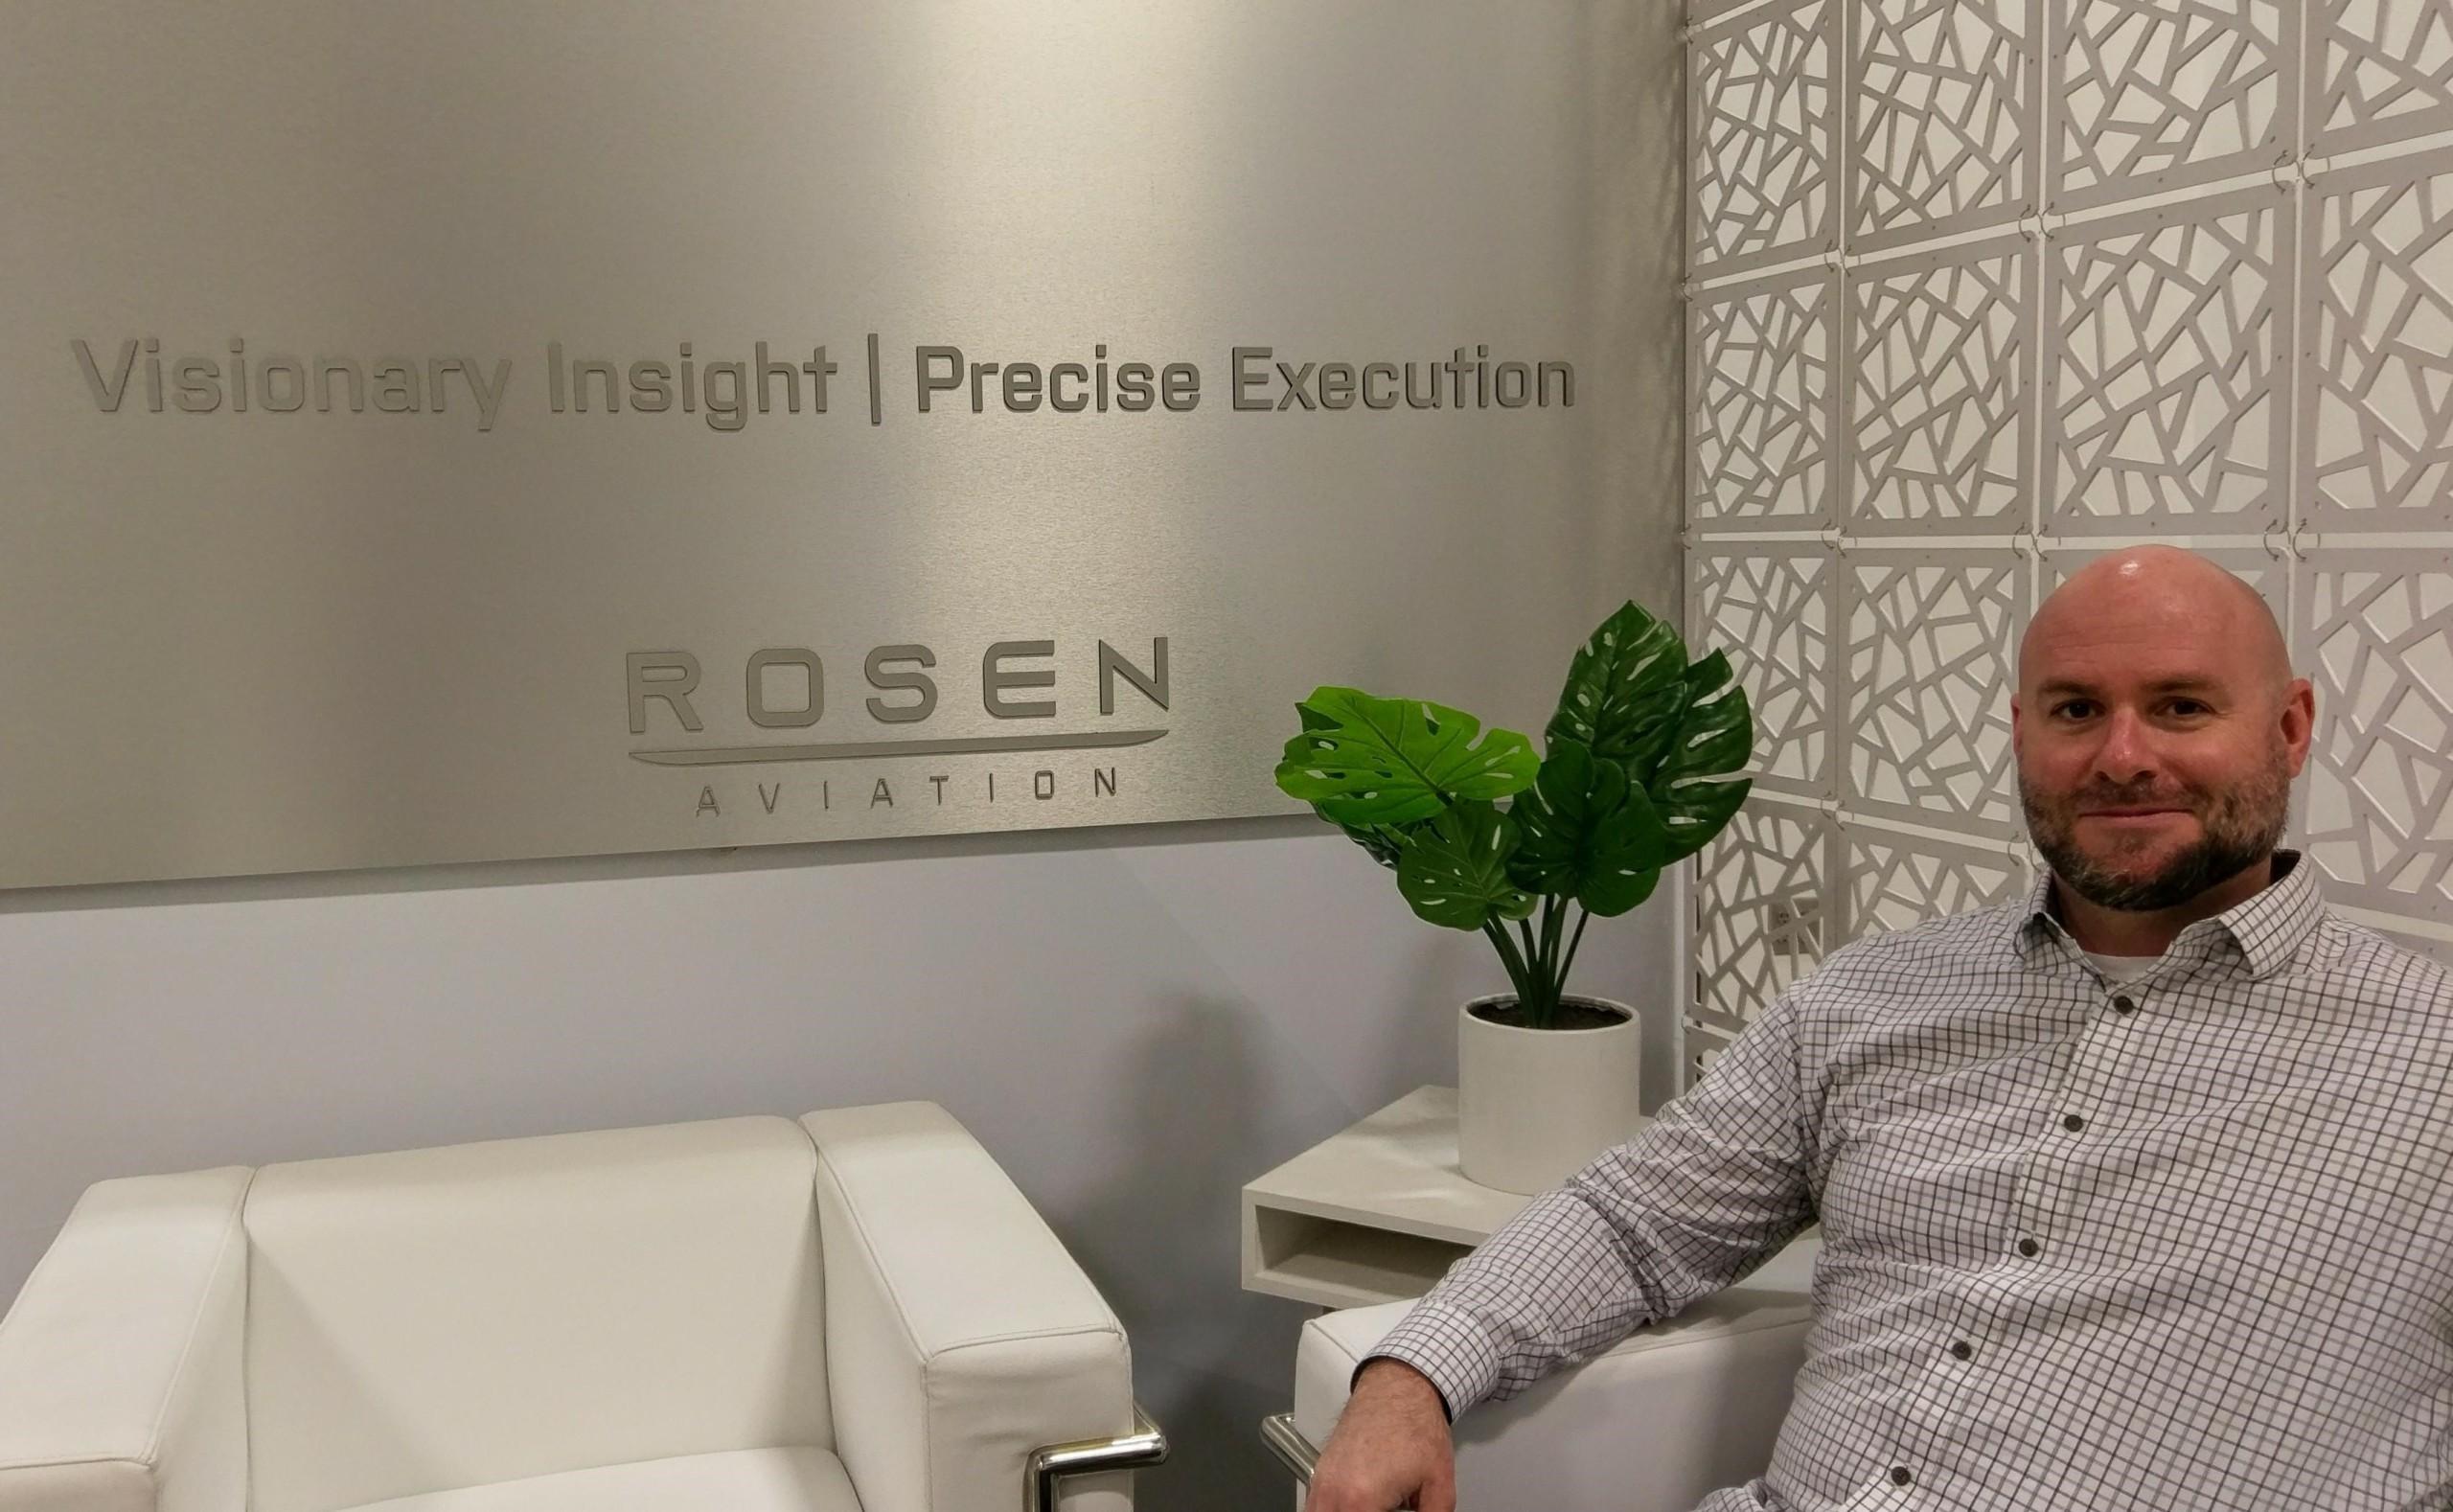 Rosen's Advocates – Jeremy Kneuper, Senior System Architect